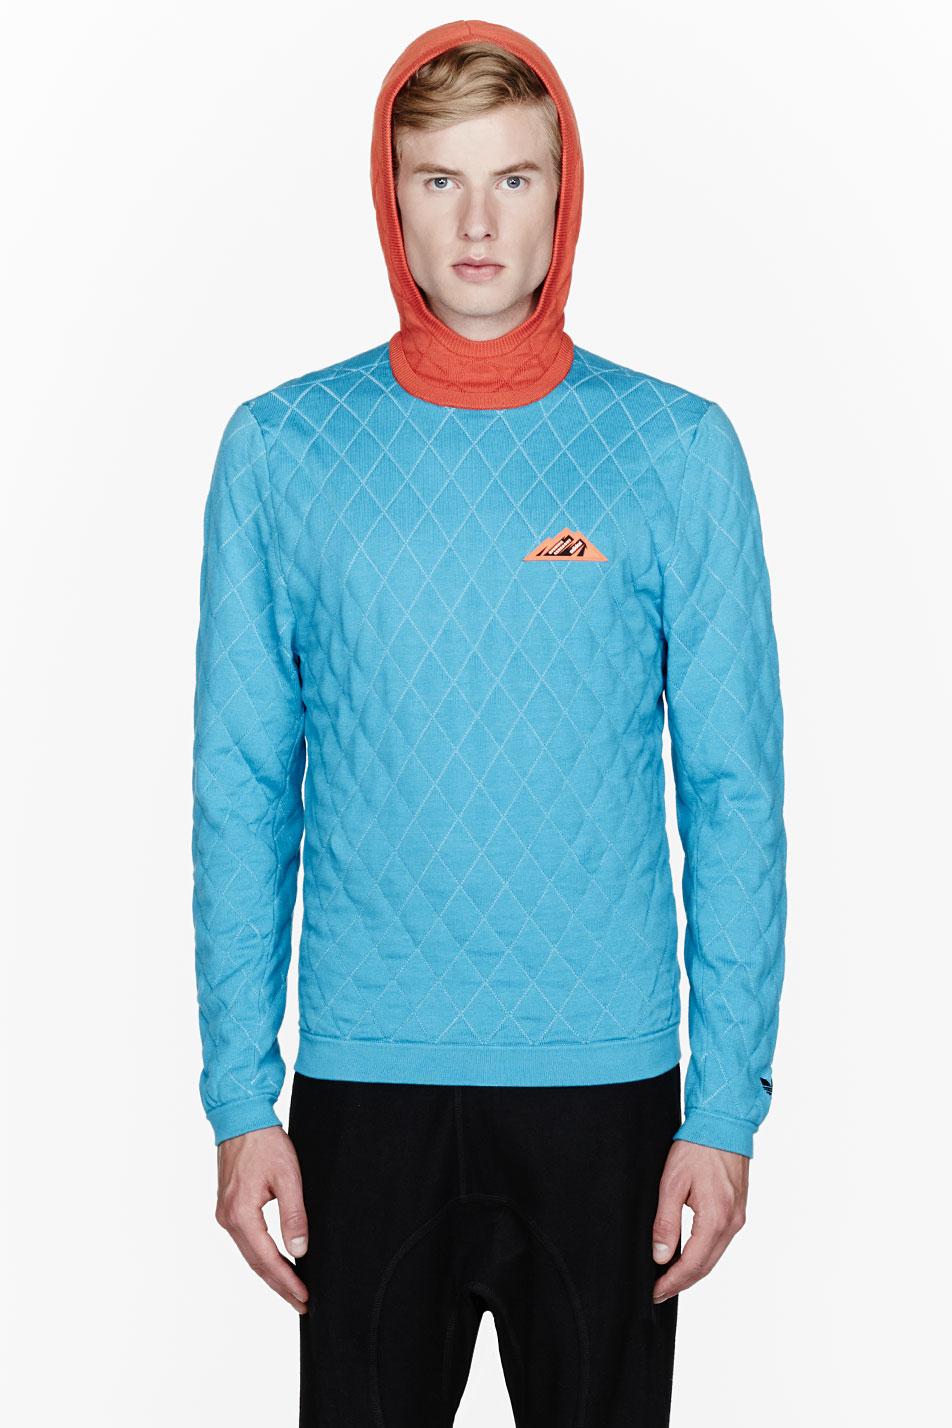 Balaclava hoodie